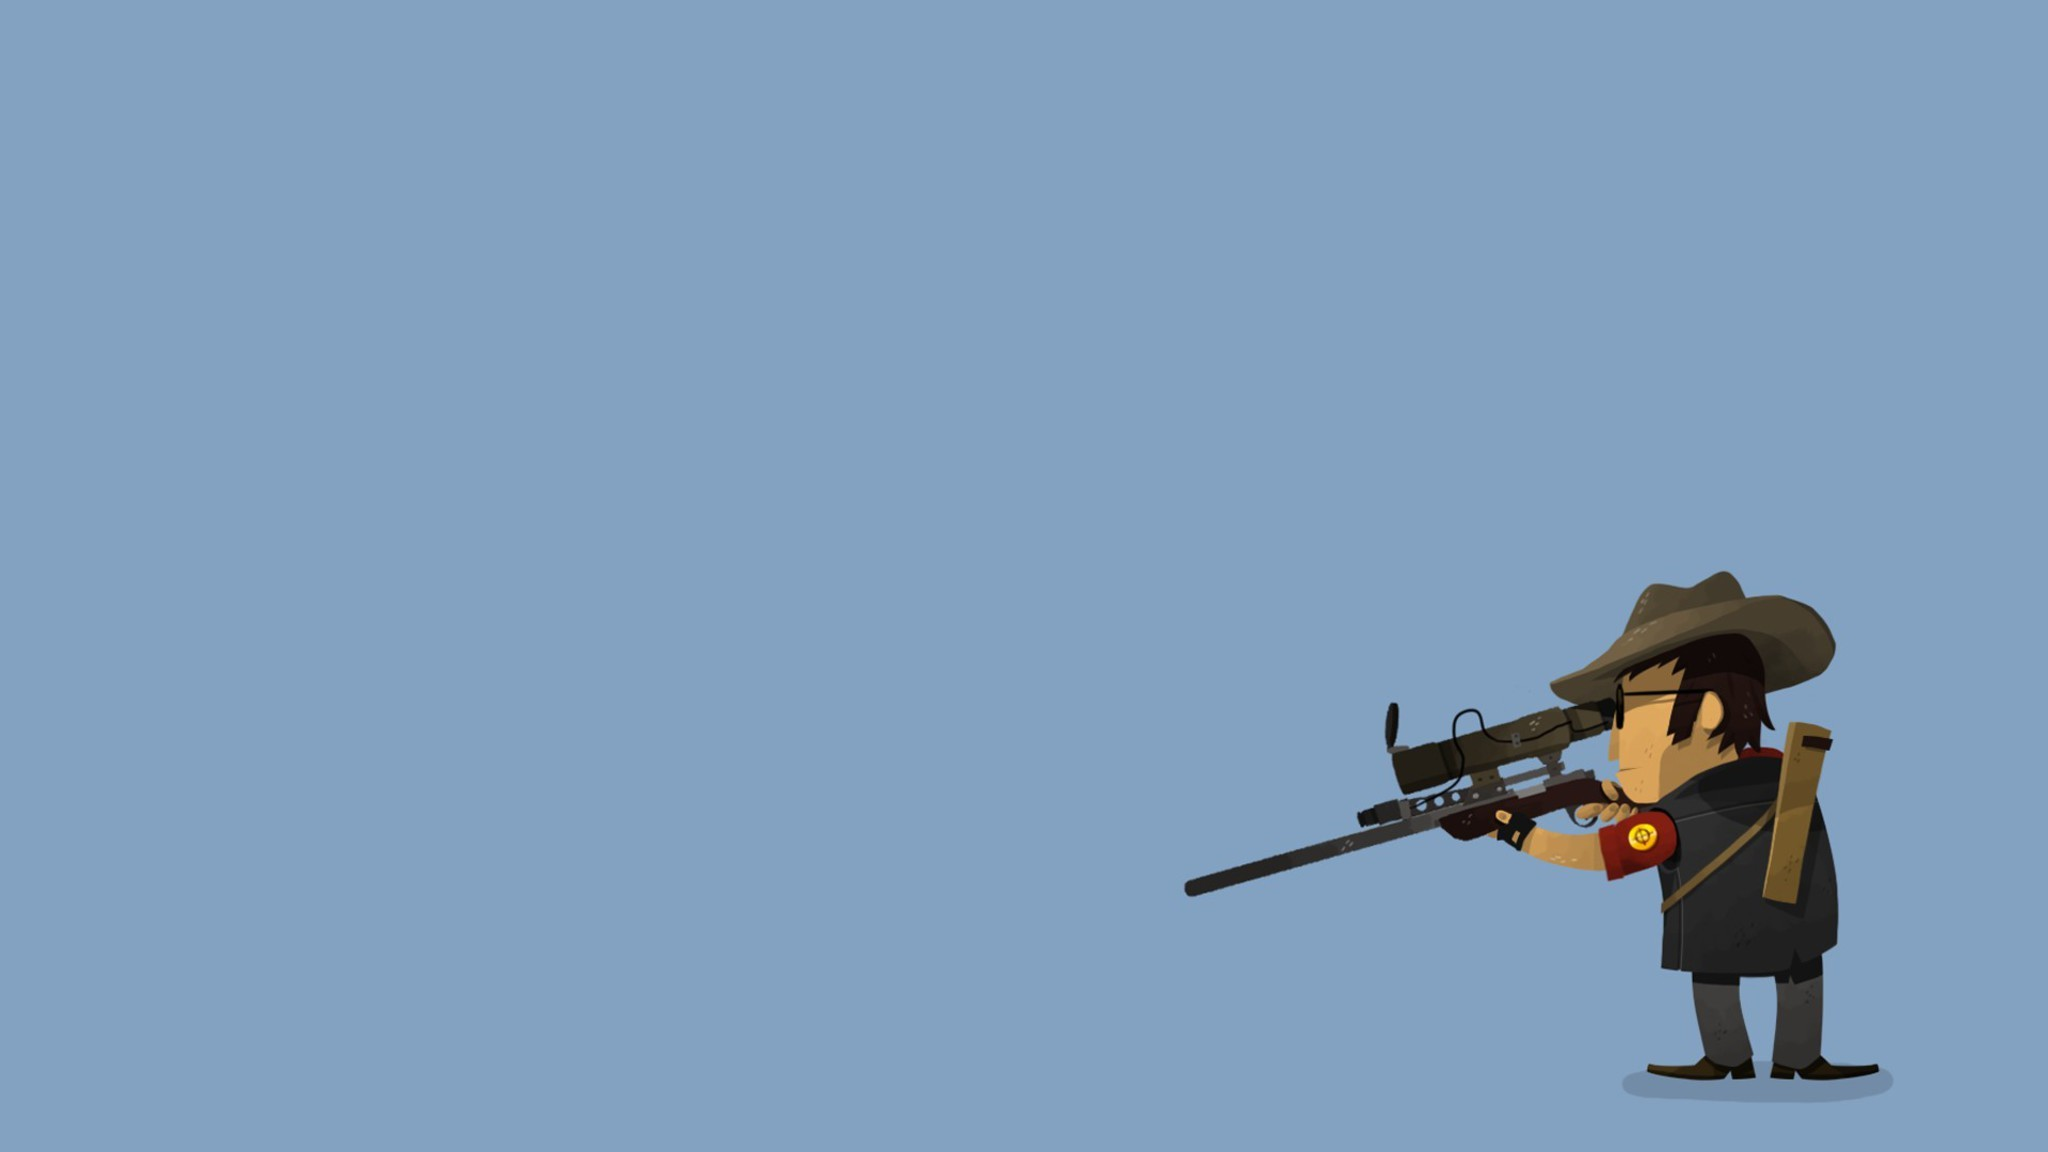 Video games team fortress 2 sniper tf2 wallpaper   AllWallpaper.in .